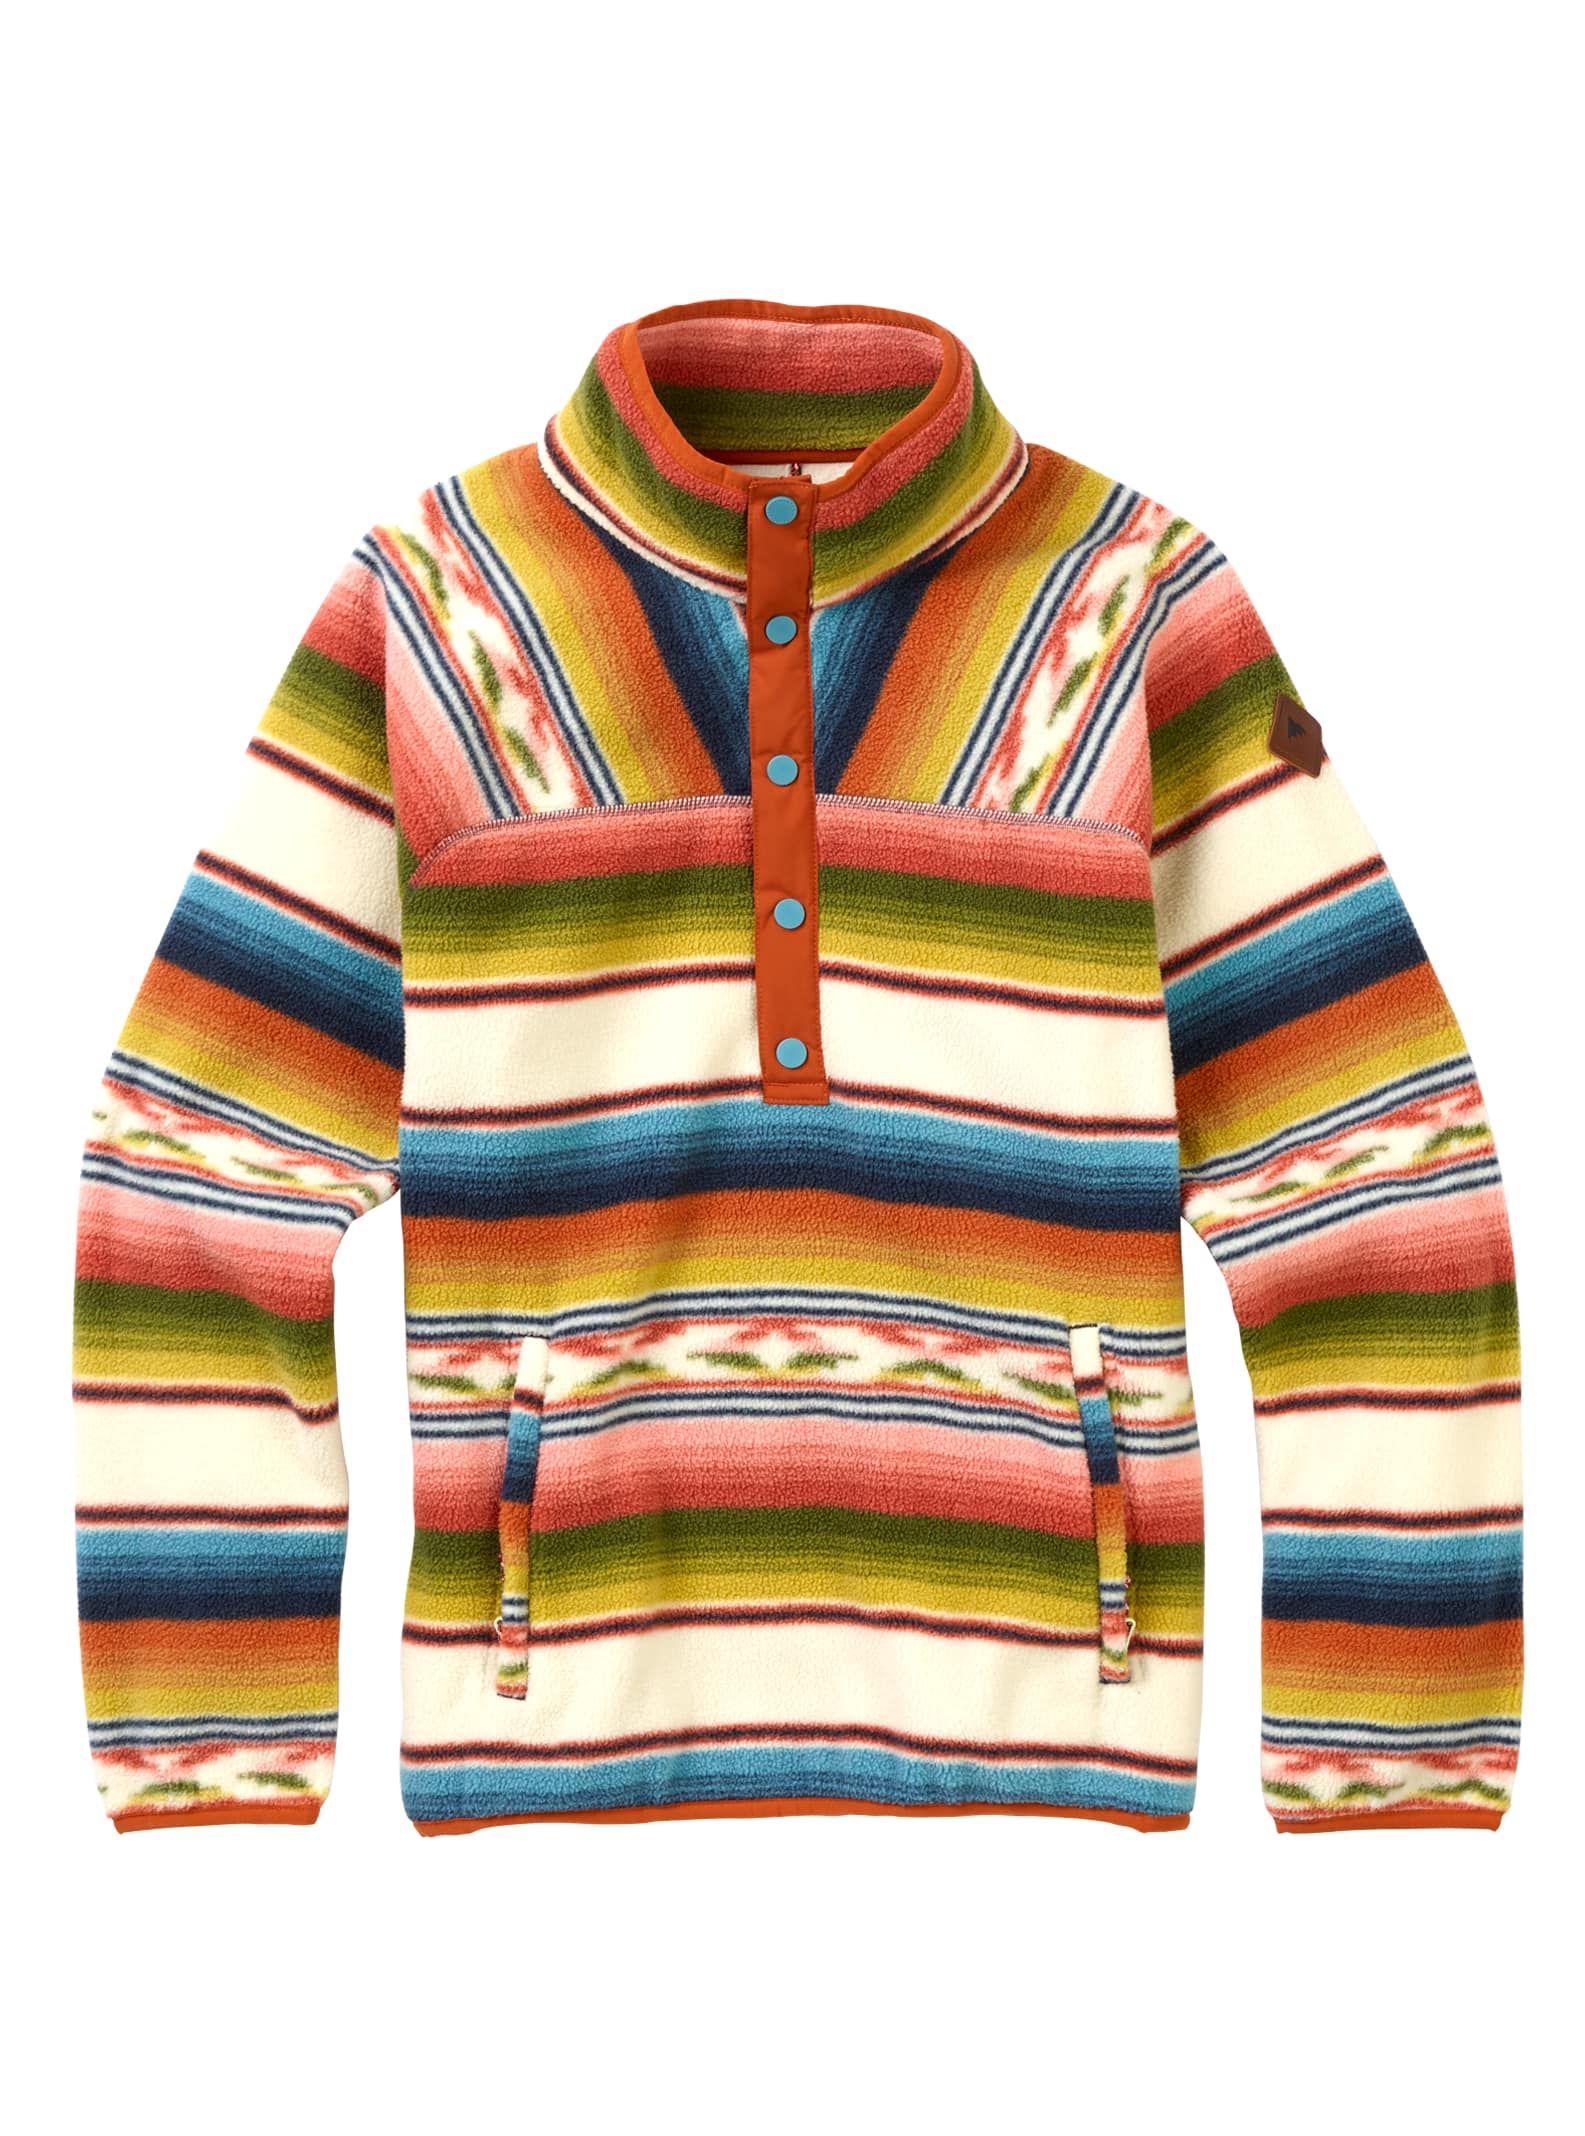 571651c3b9 Women's Burton Hearth Fleece Pullover in 2019 | Products | Outerwear ...